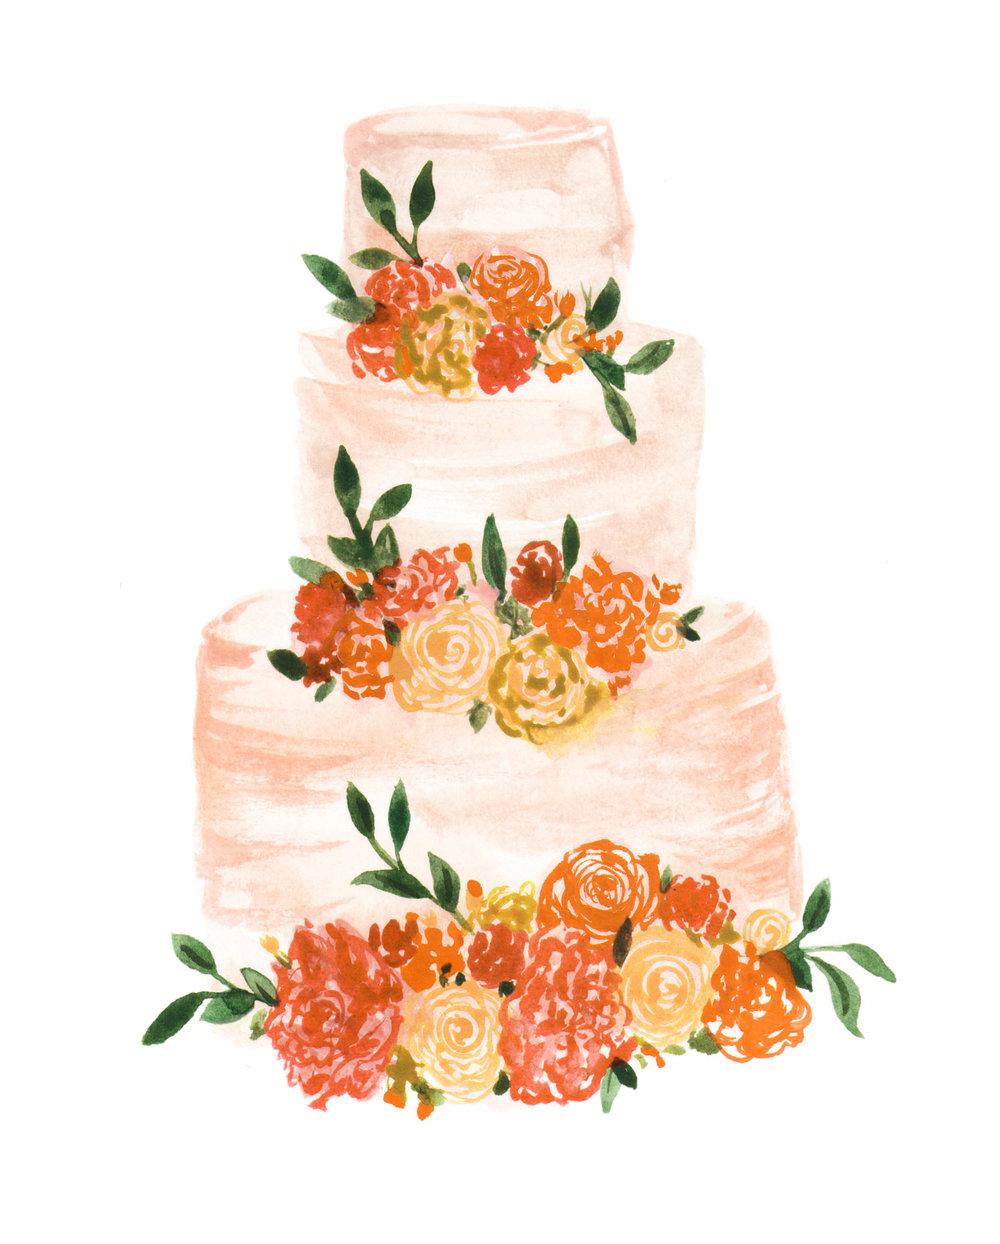 wedding_1_cake_flowers.jpg